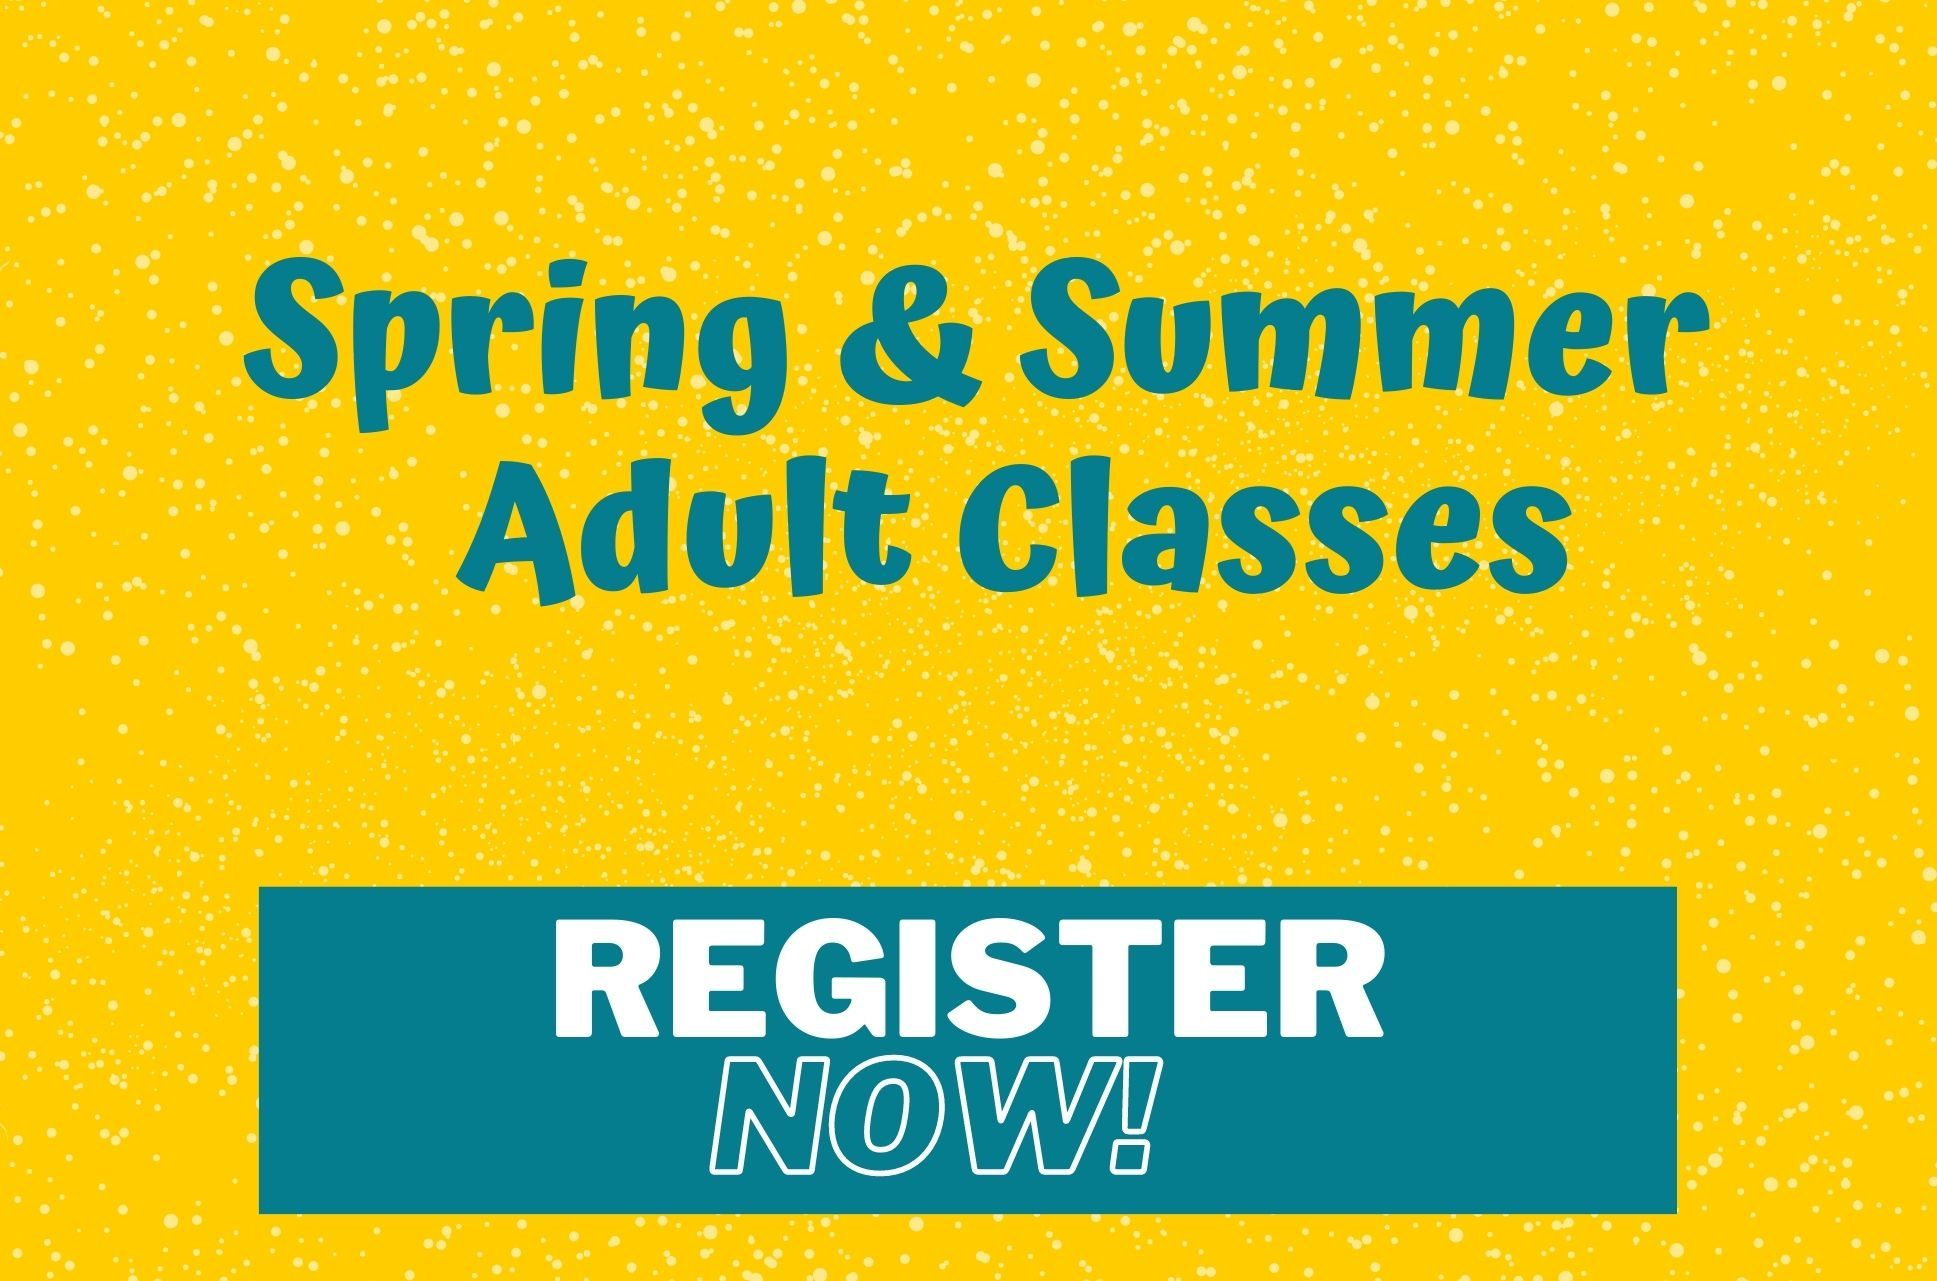 Register Now for Spring & Summer 2021 Adult Classes